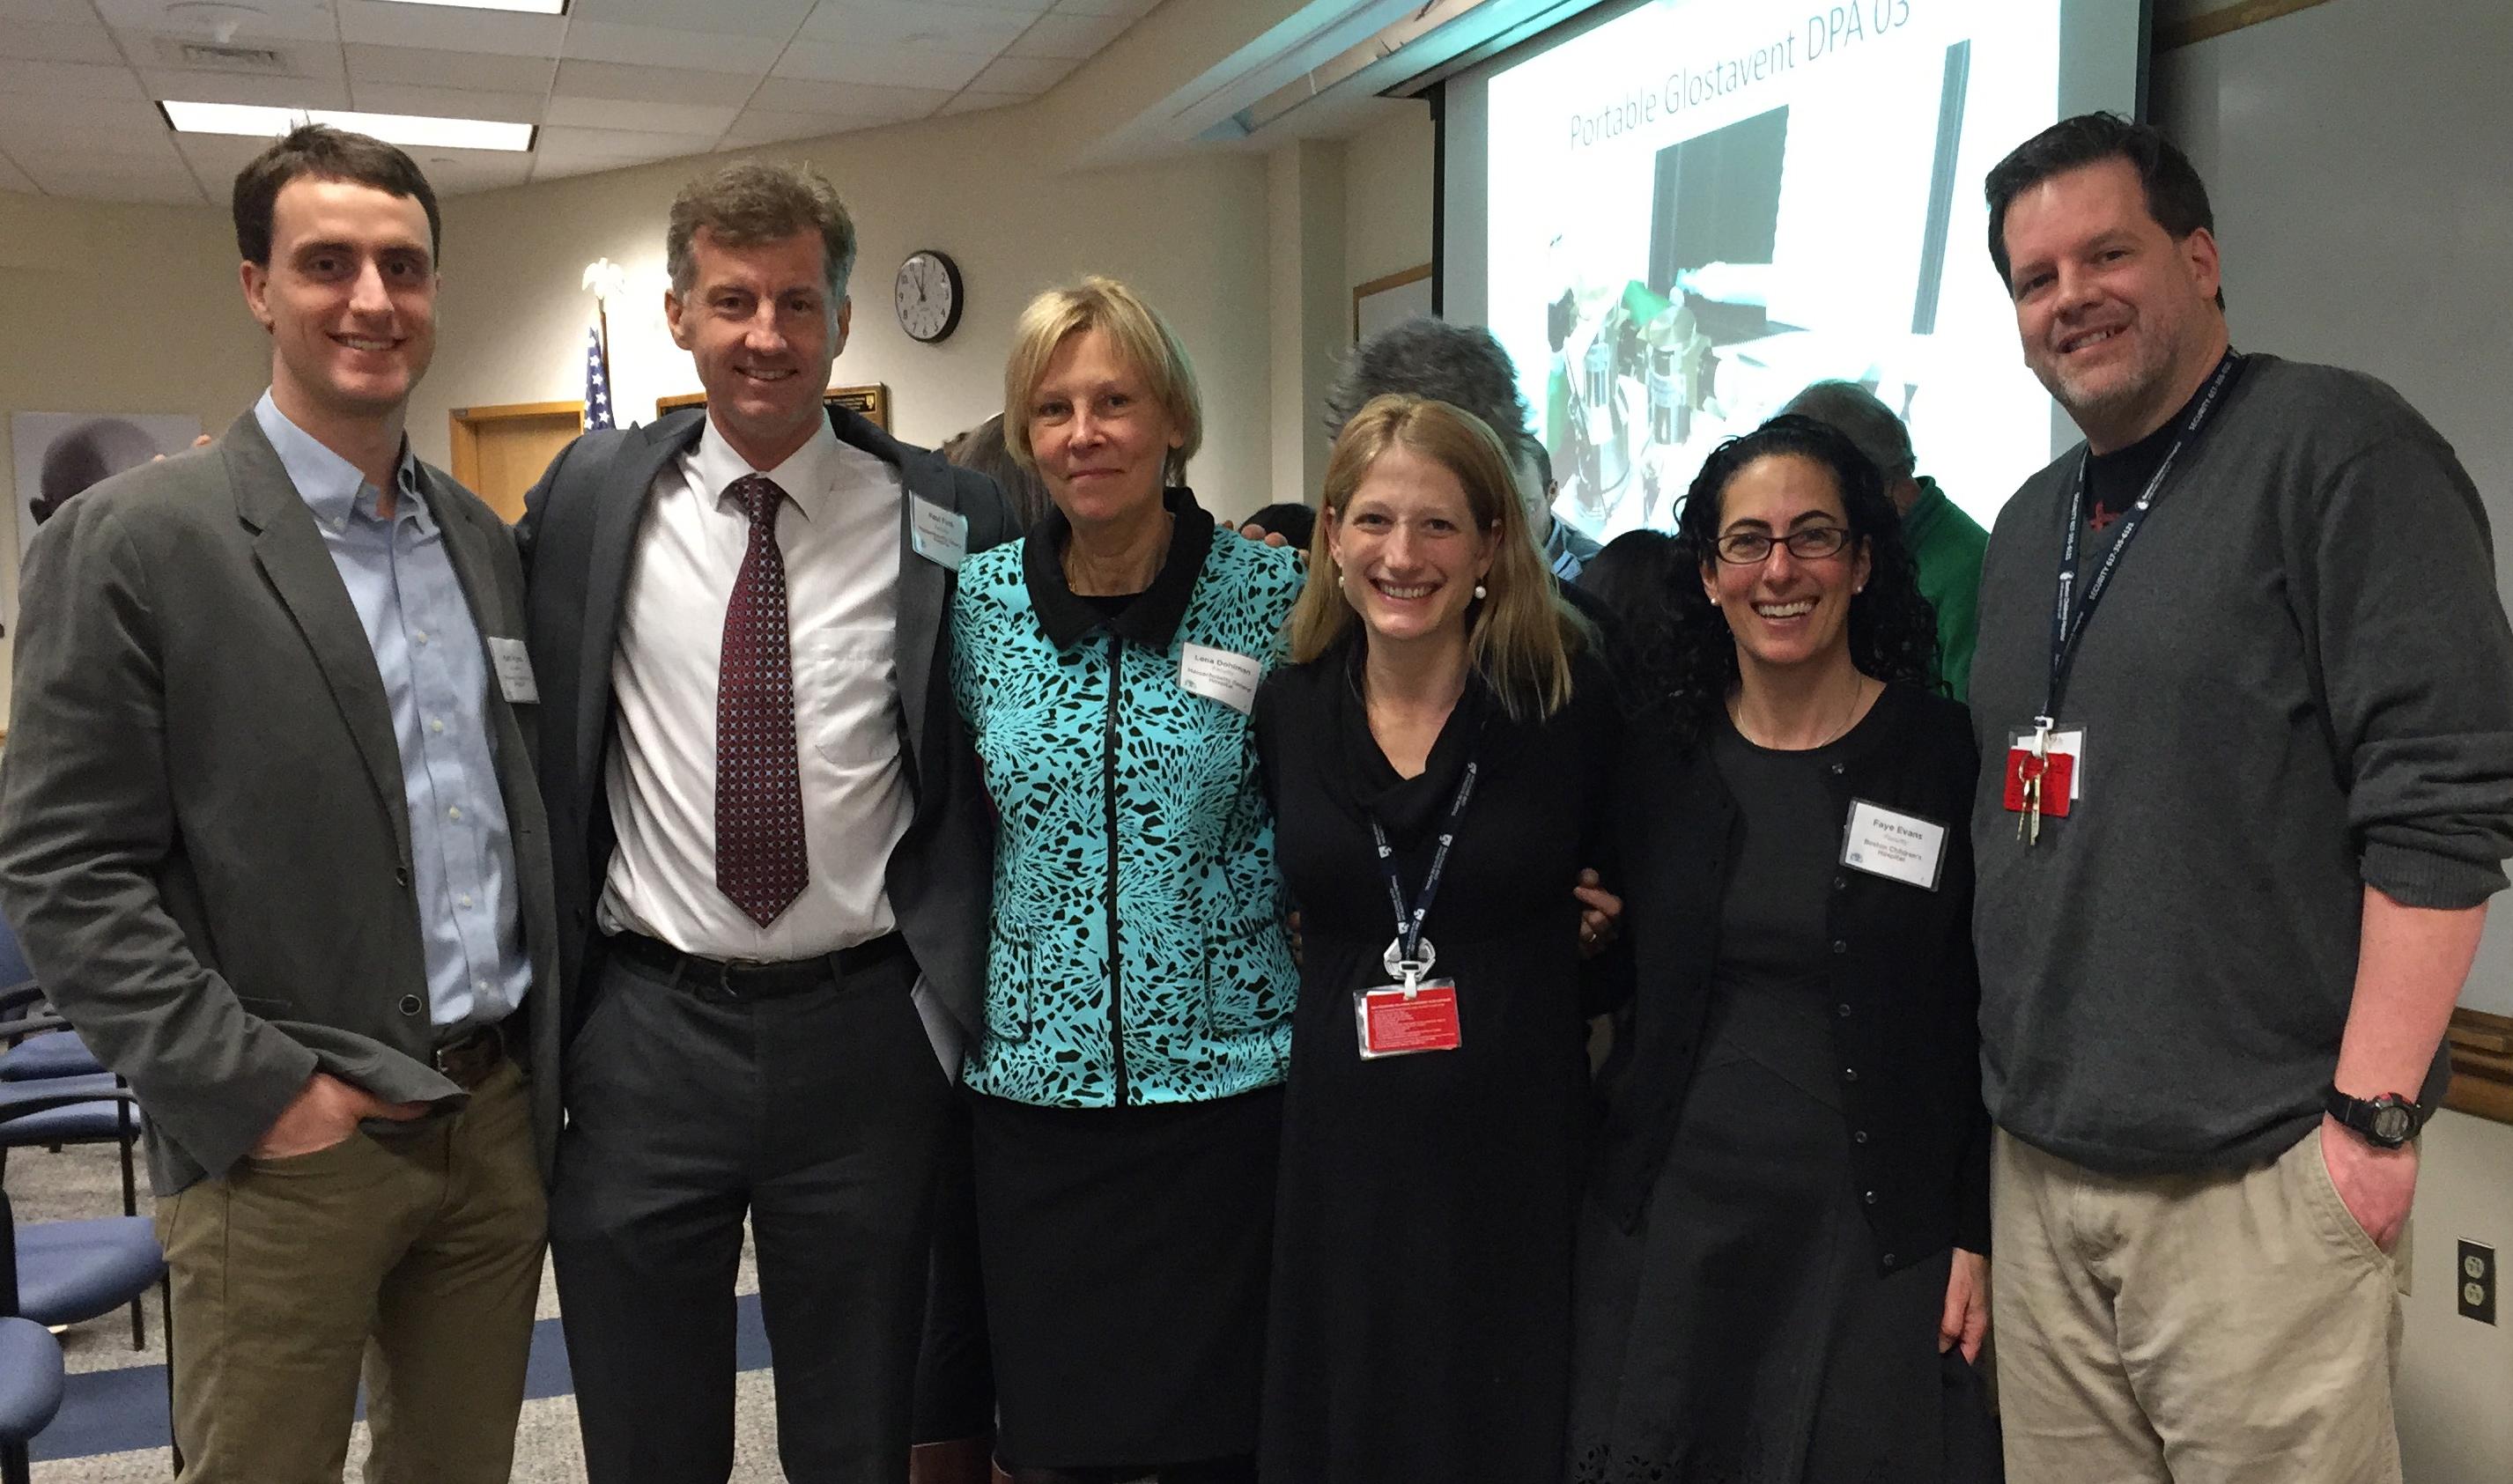 2015 Global Anesthesia Workshop: Presentations and Photos – Harvard